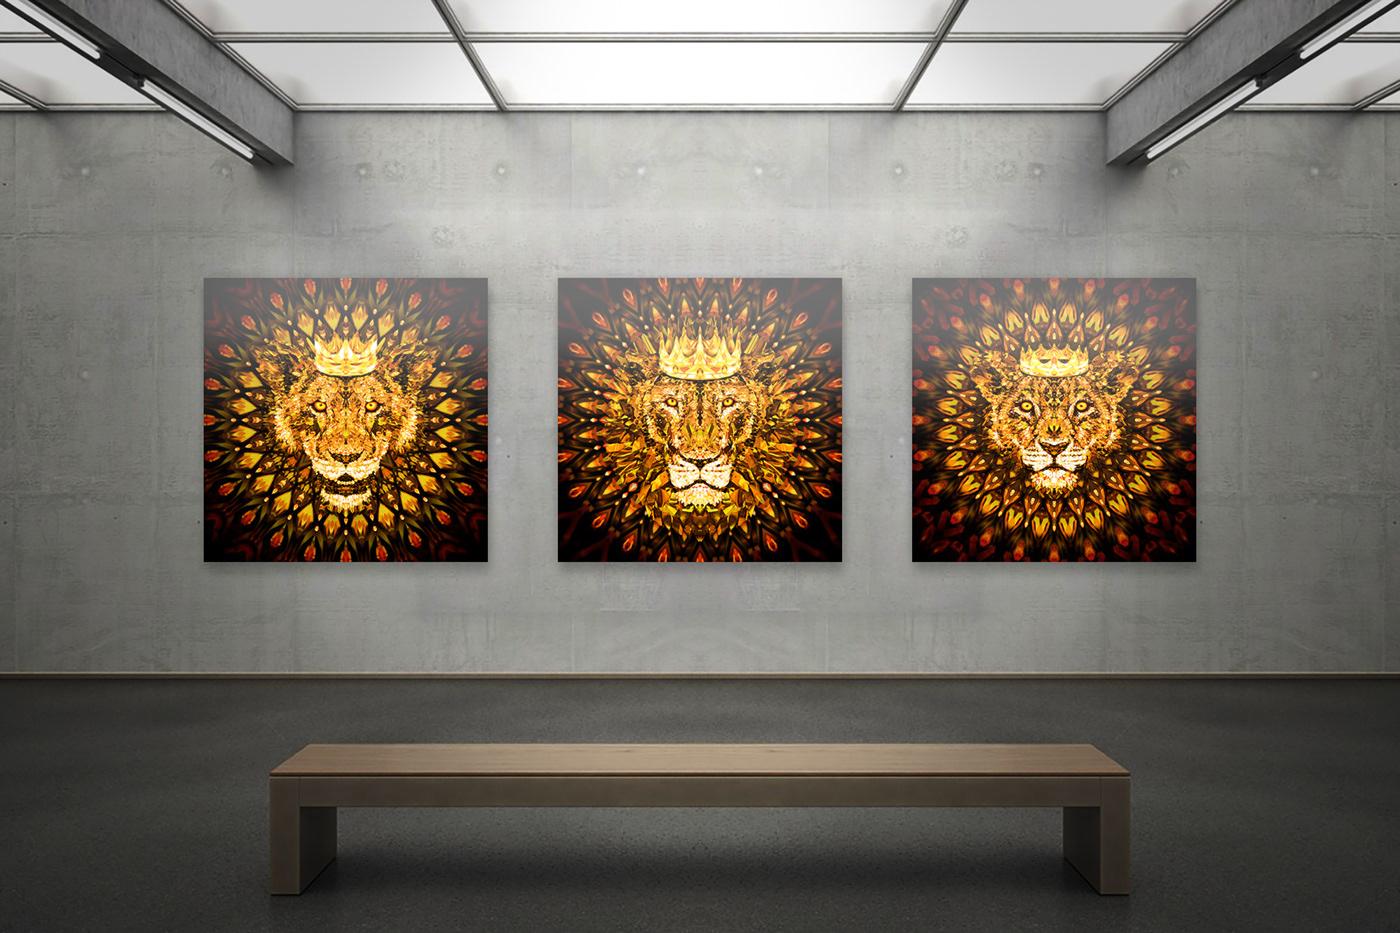 africa animal crown diamond  gold king lion Mandala nft vector